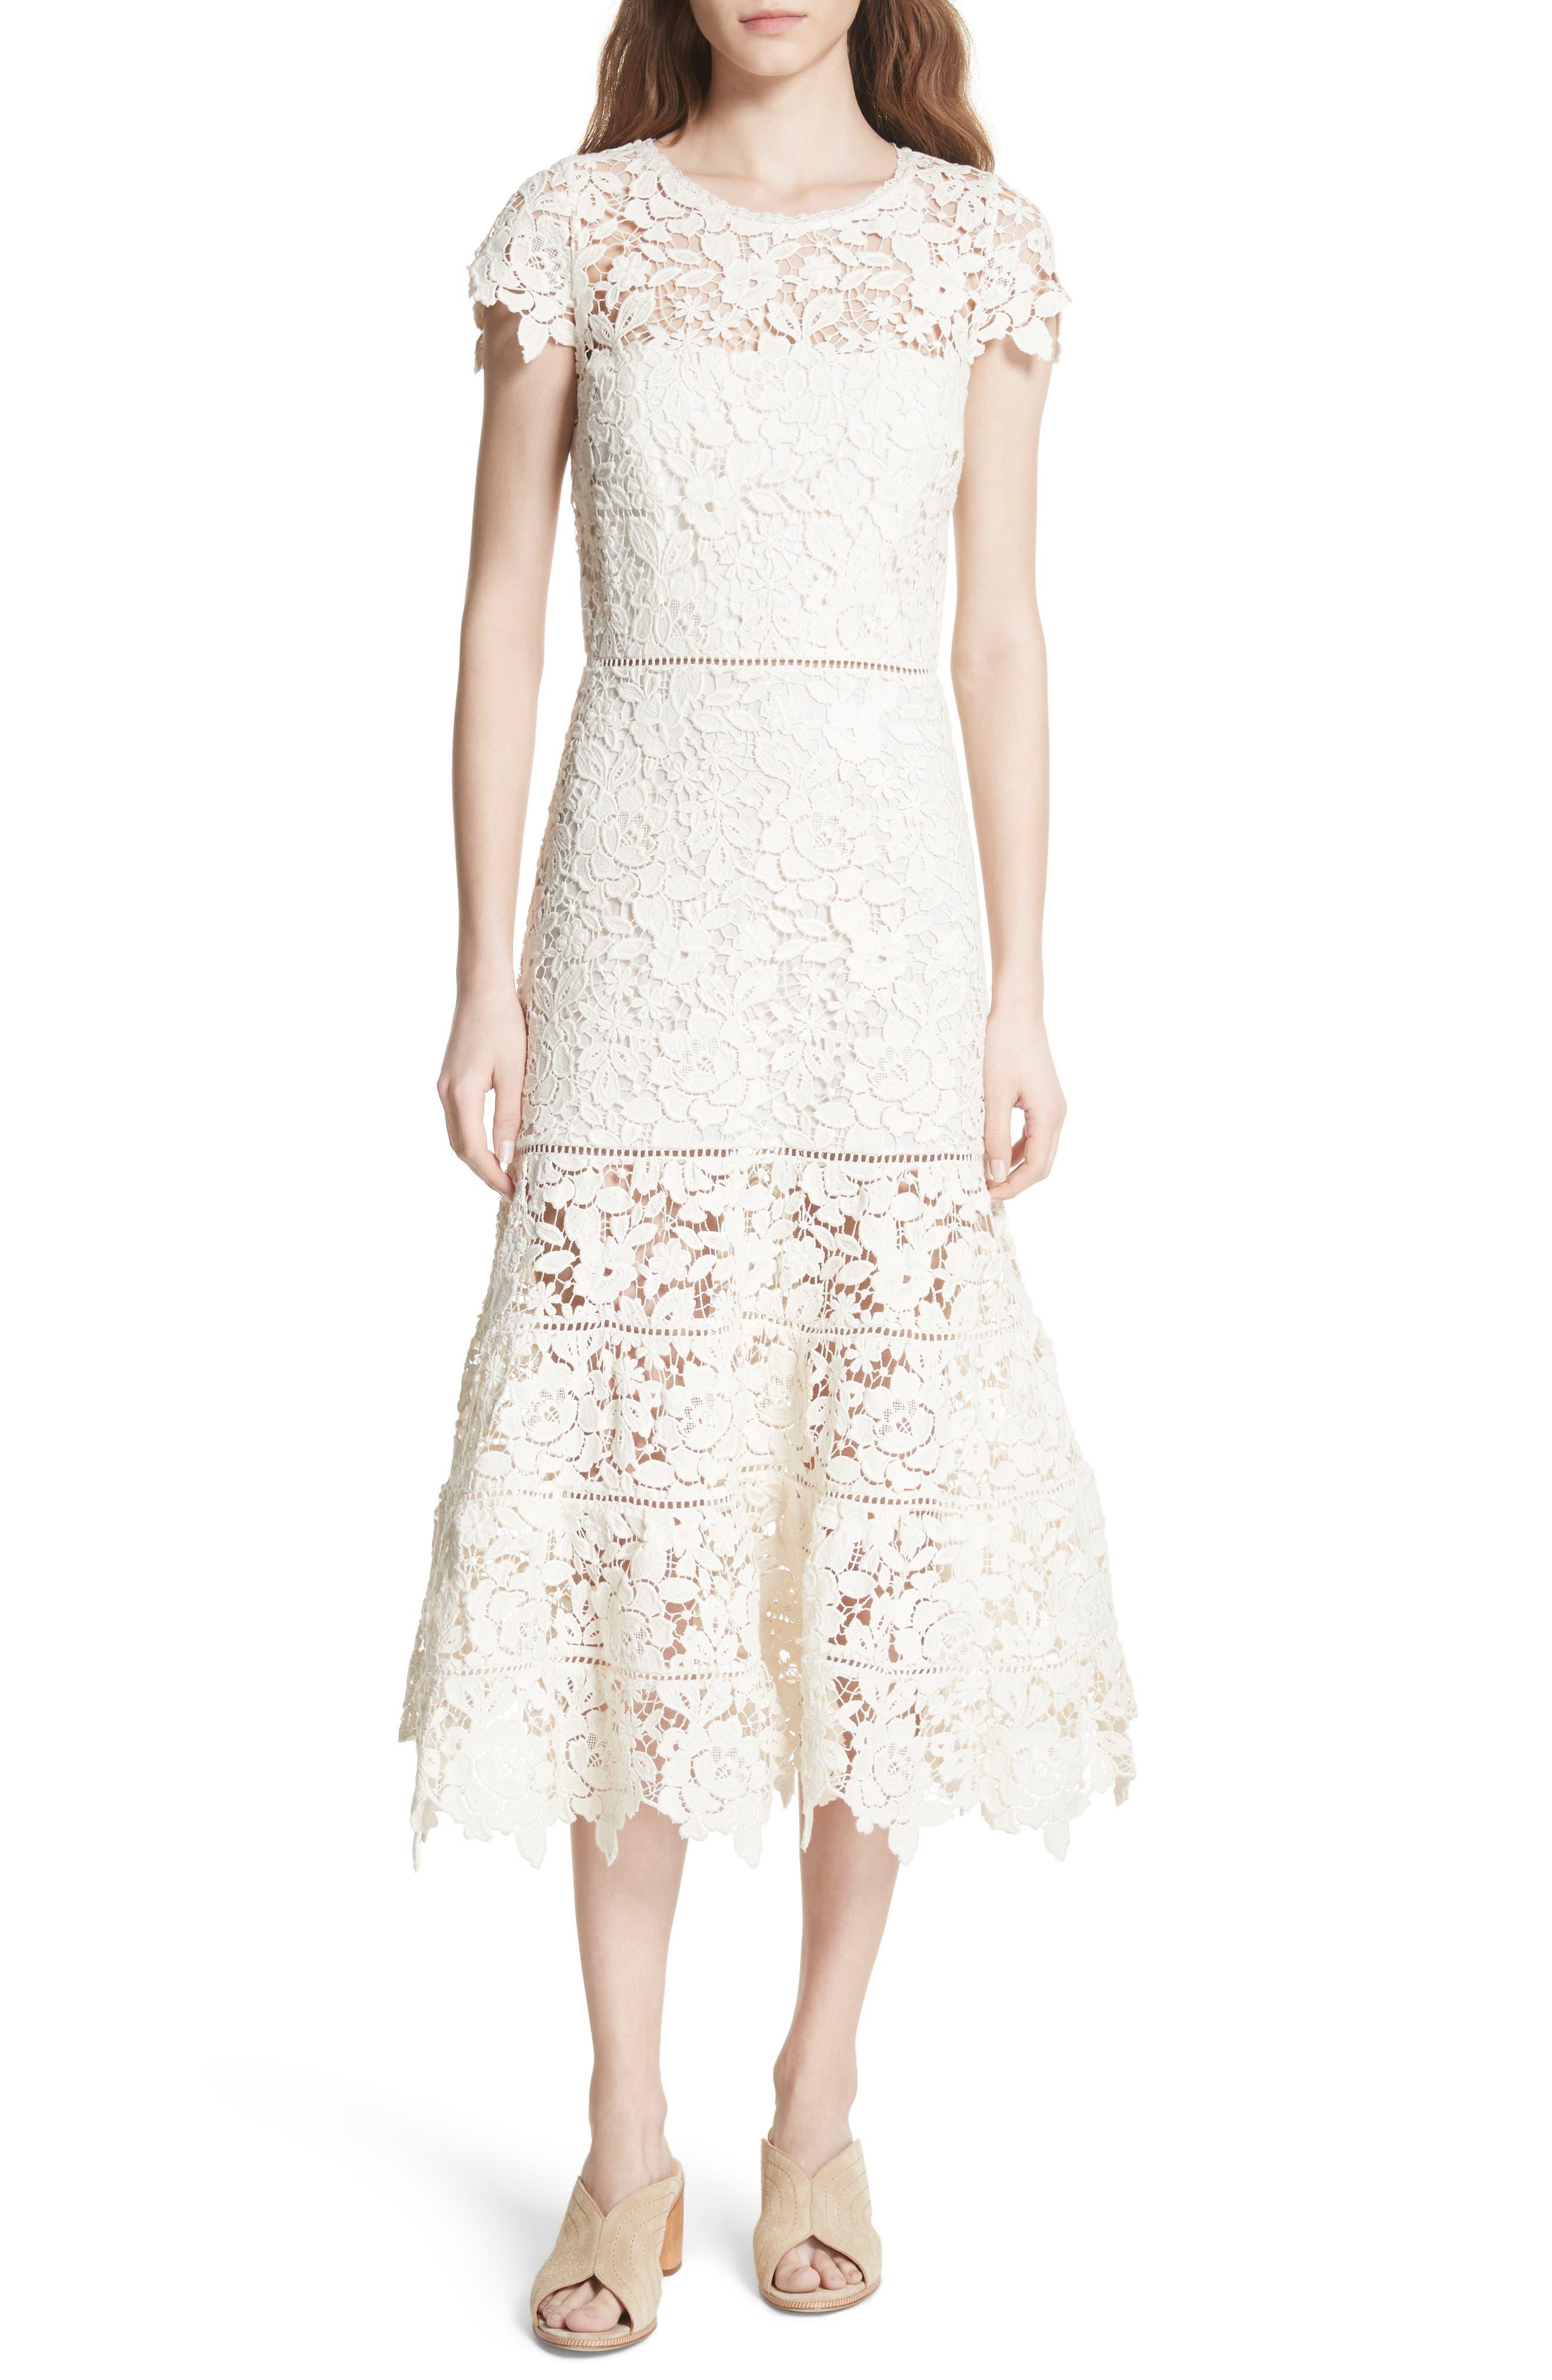 Joie Celedonia Scallop Lace Dress